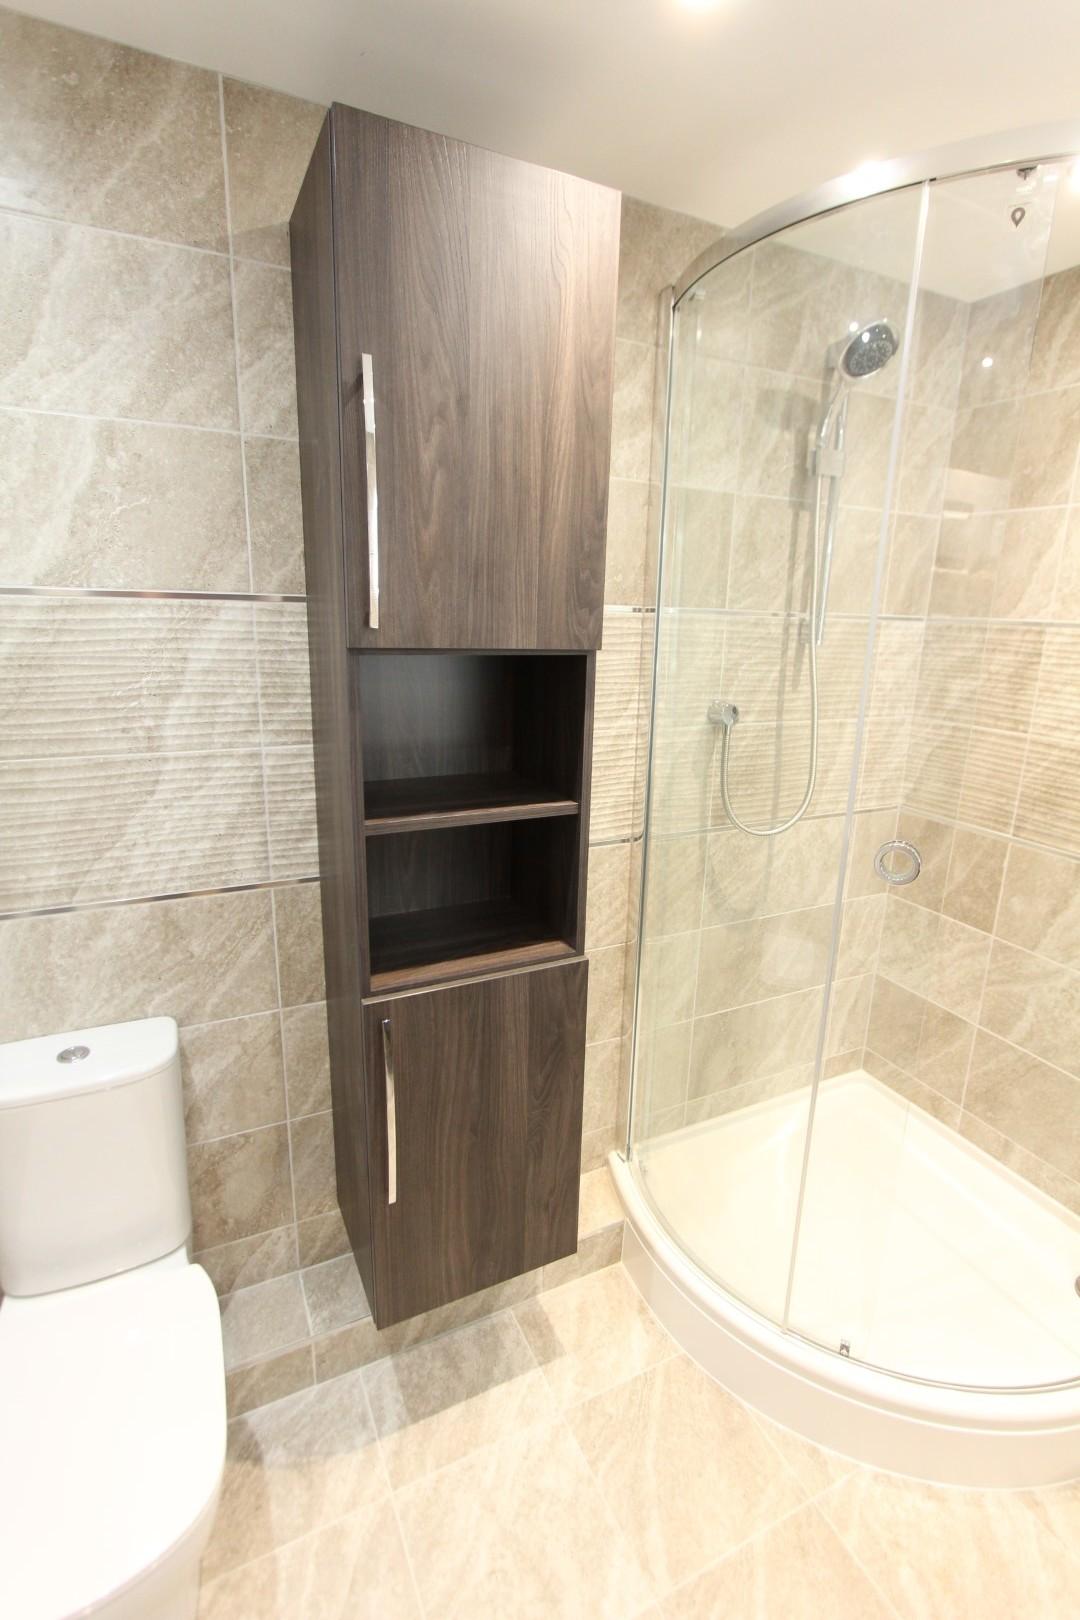 Dack Atlantic Bathrooms & Kitchens (7).jpeg